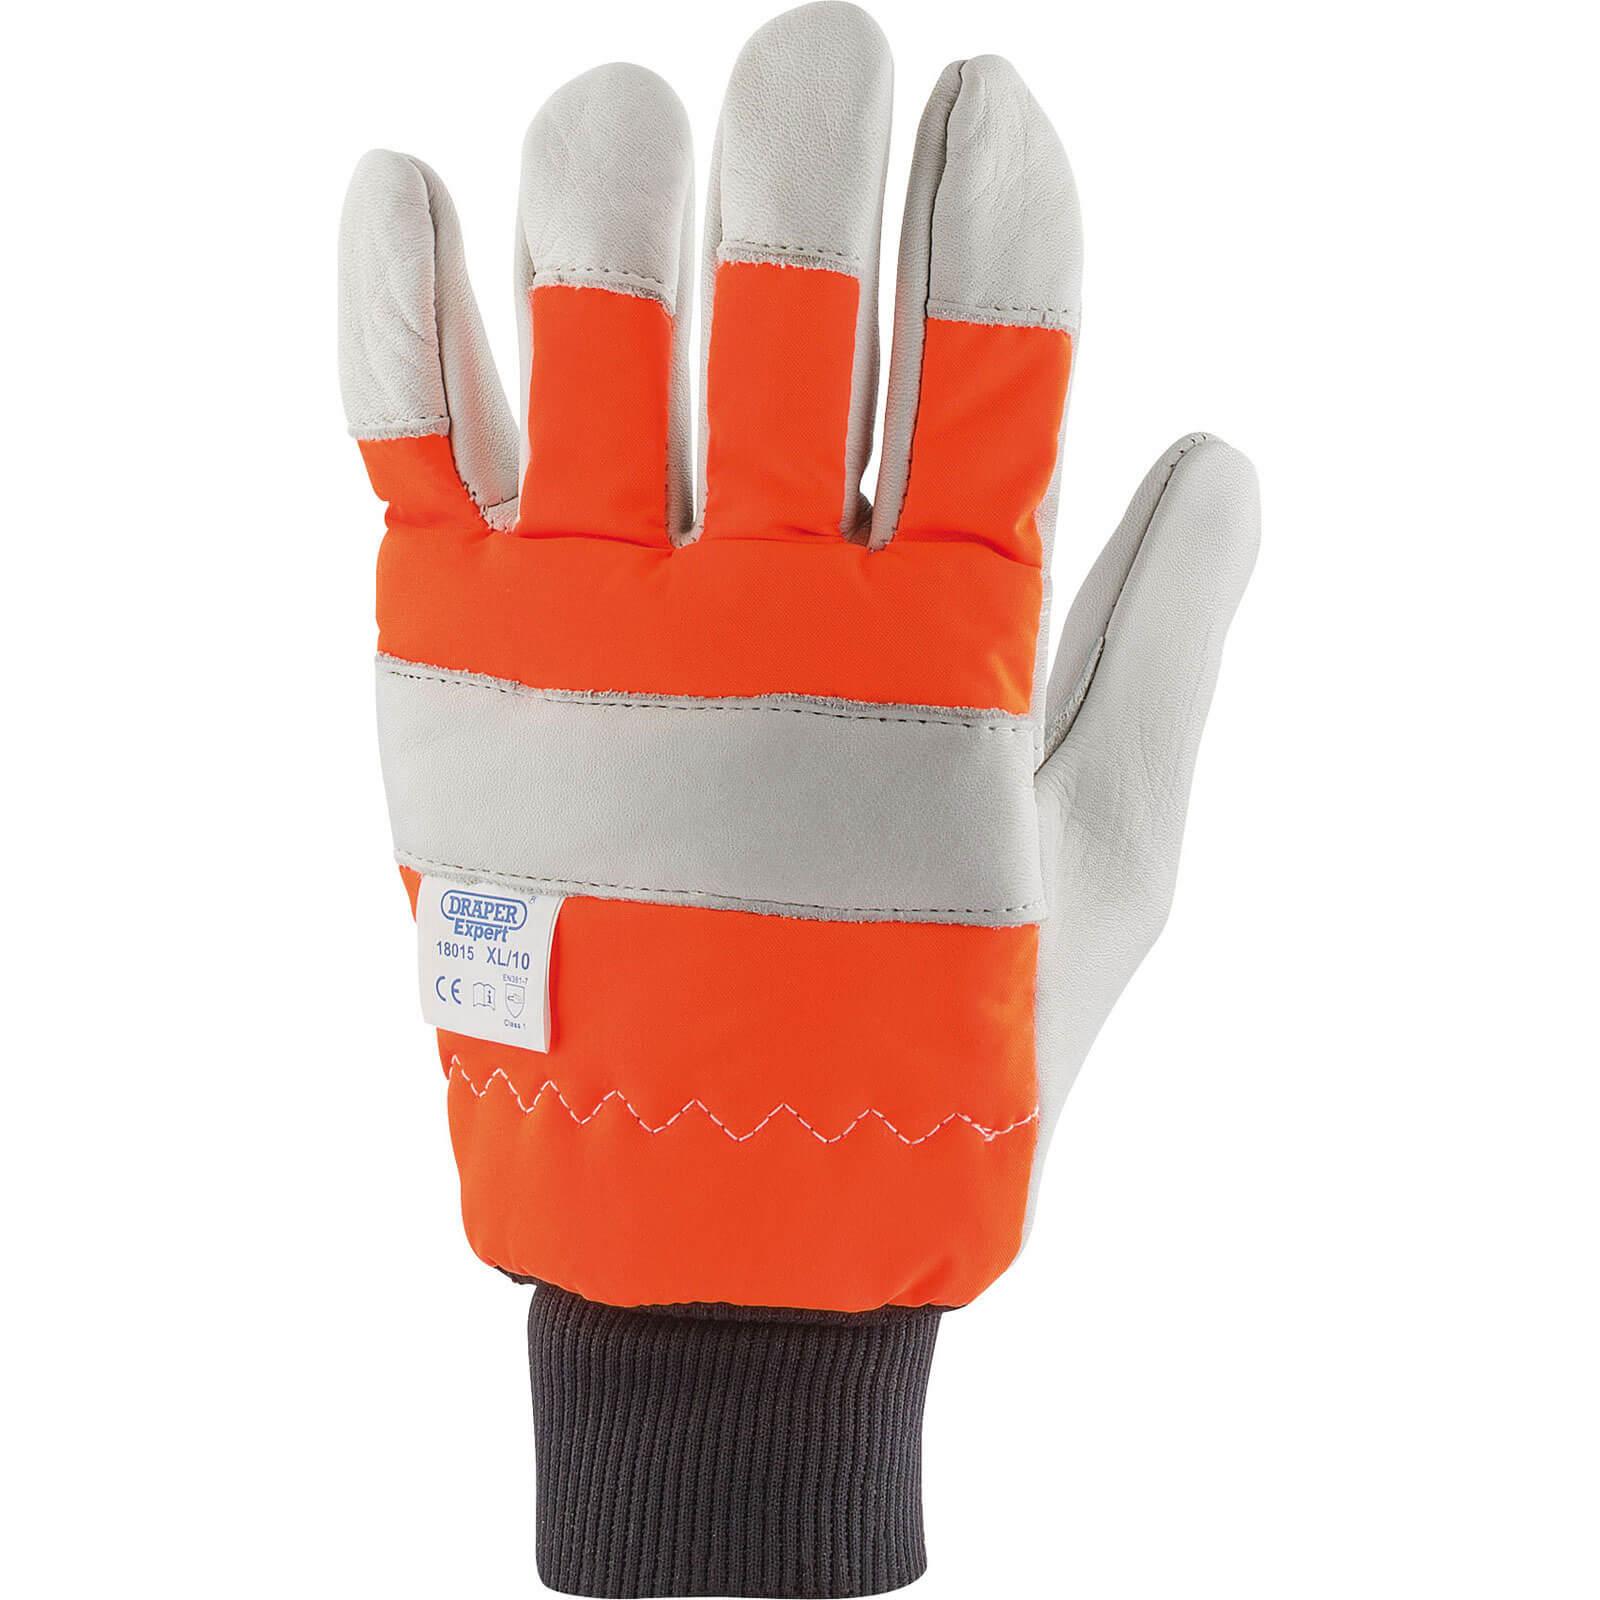 Image of Draper Chainsaw Gloves L